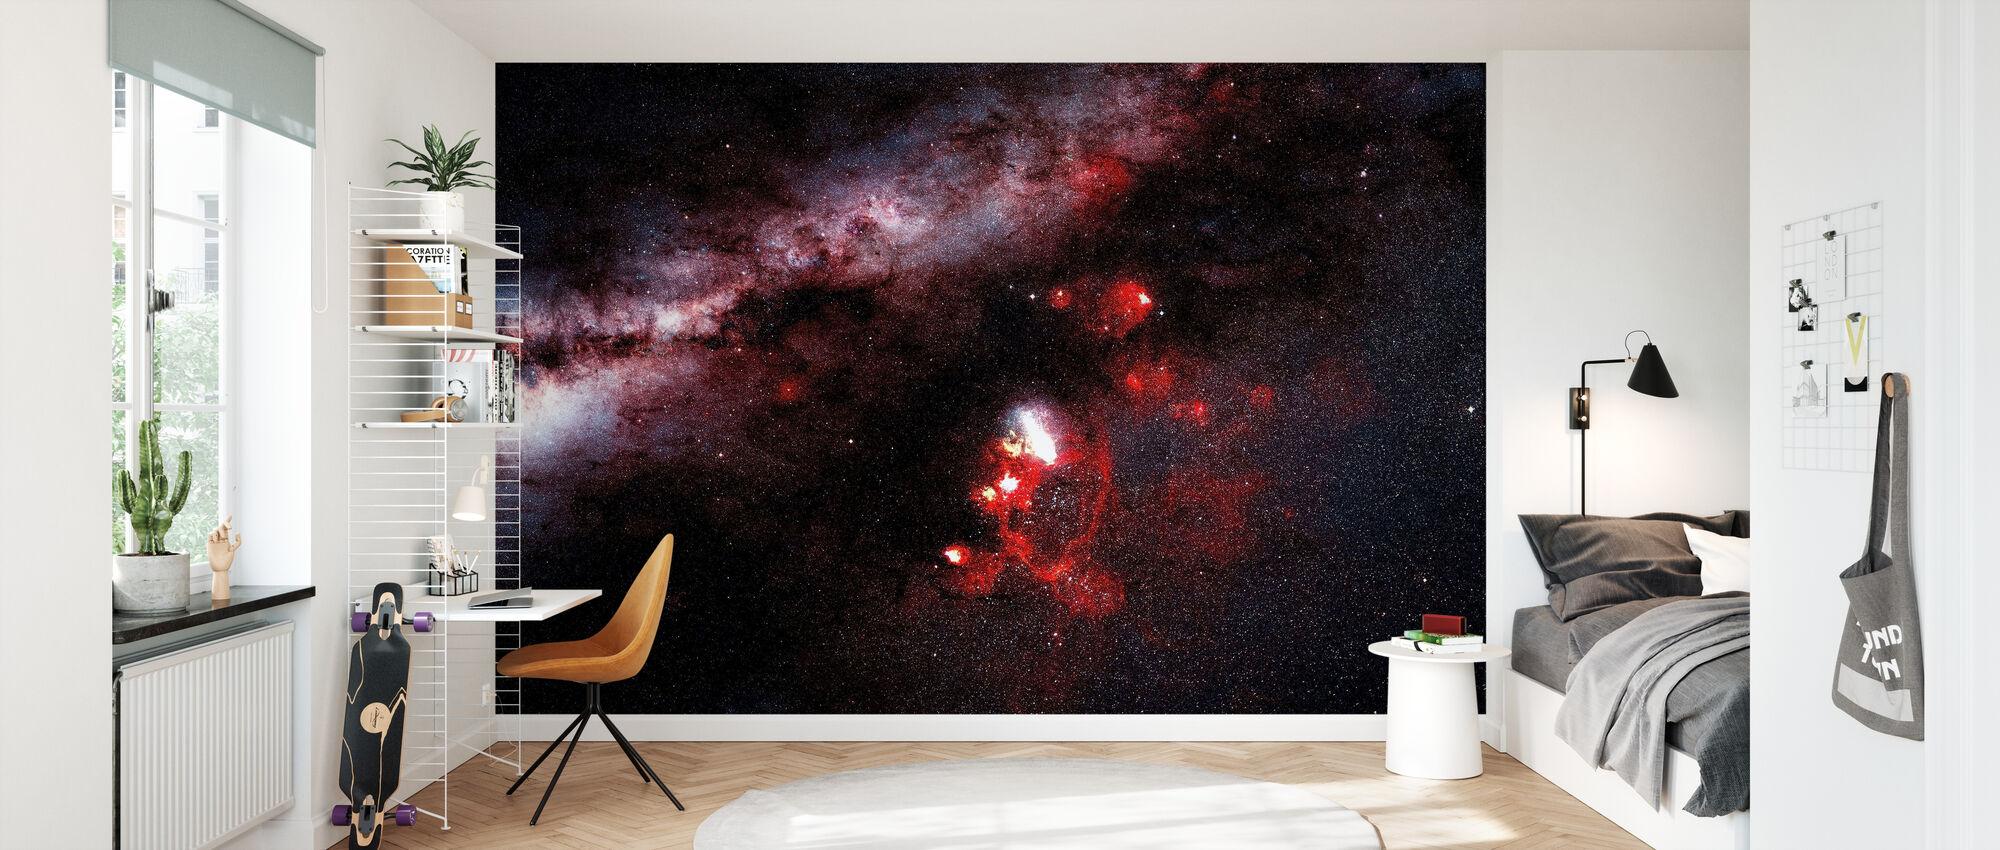 Darkness in the Galaxy - Wallpaper - Kids Room